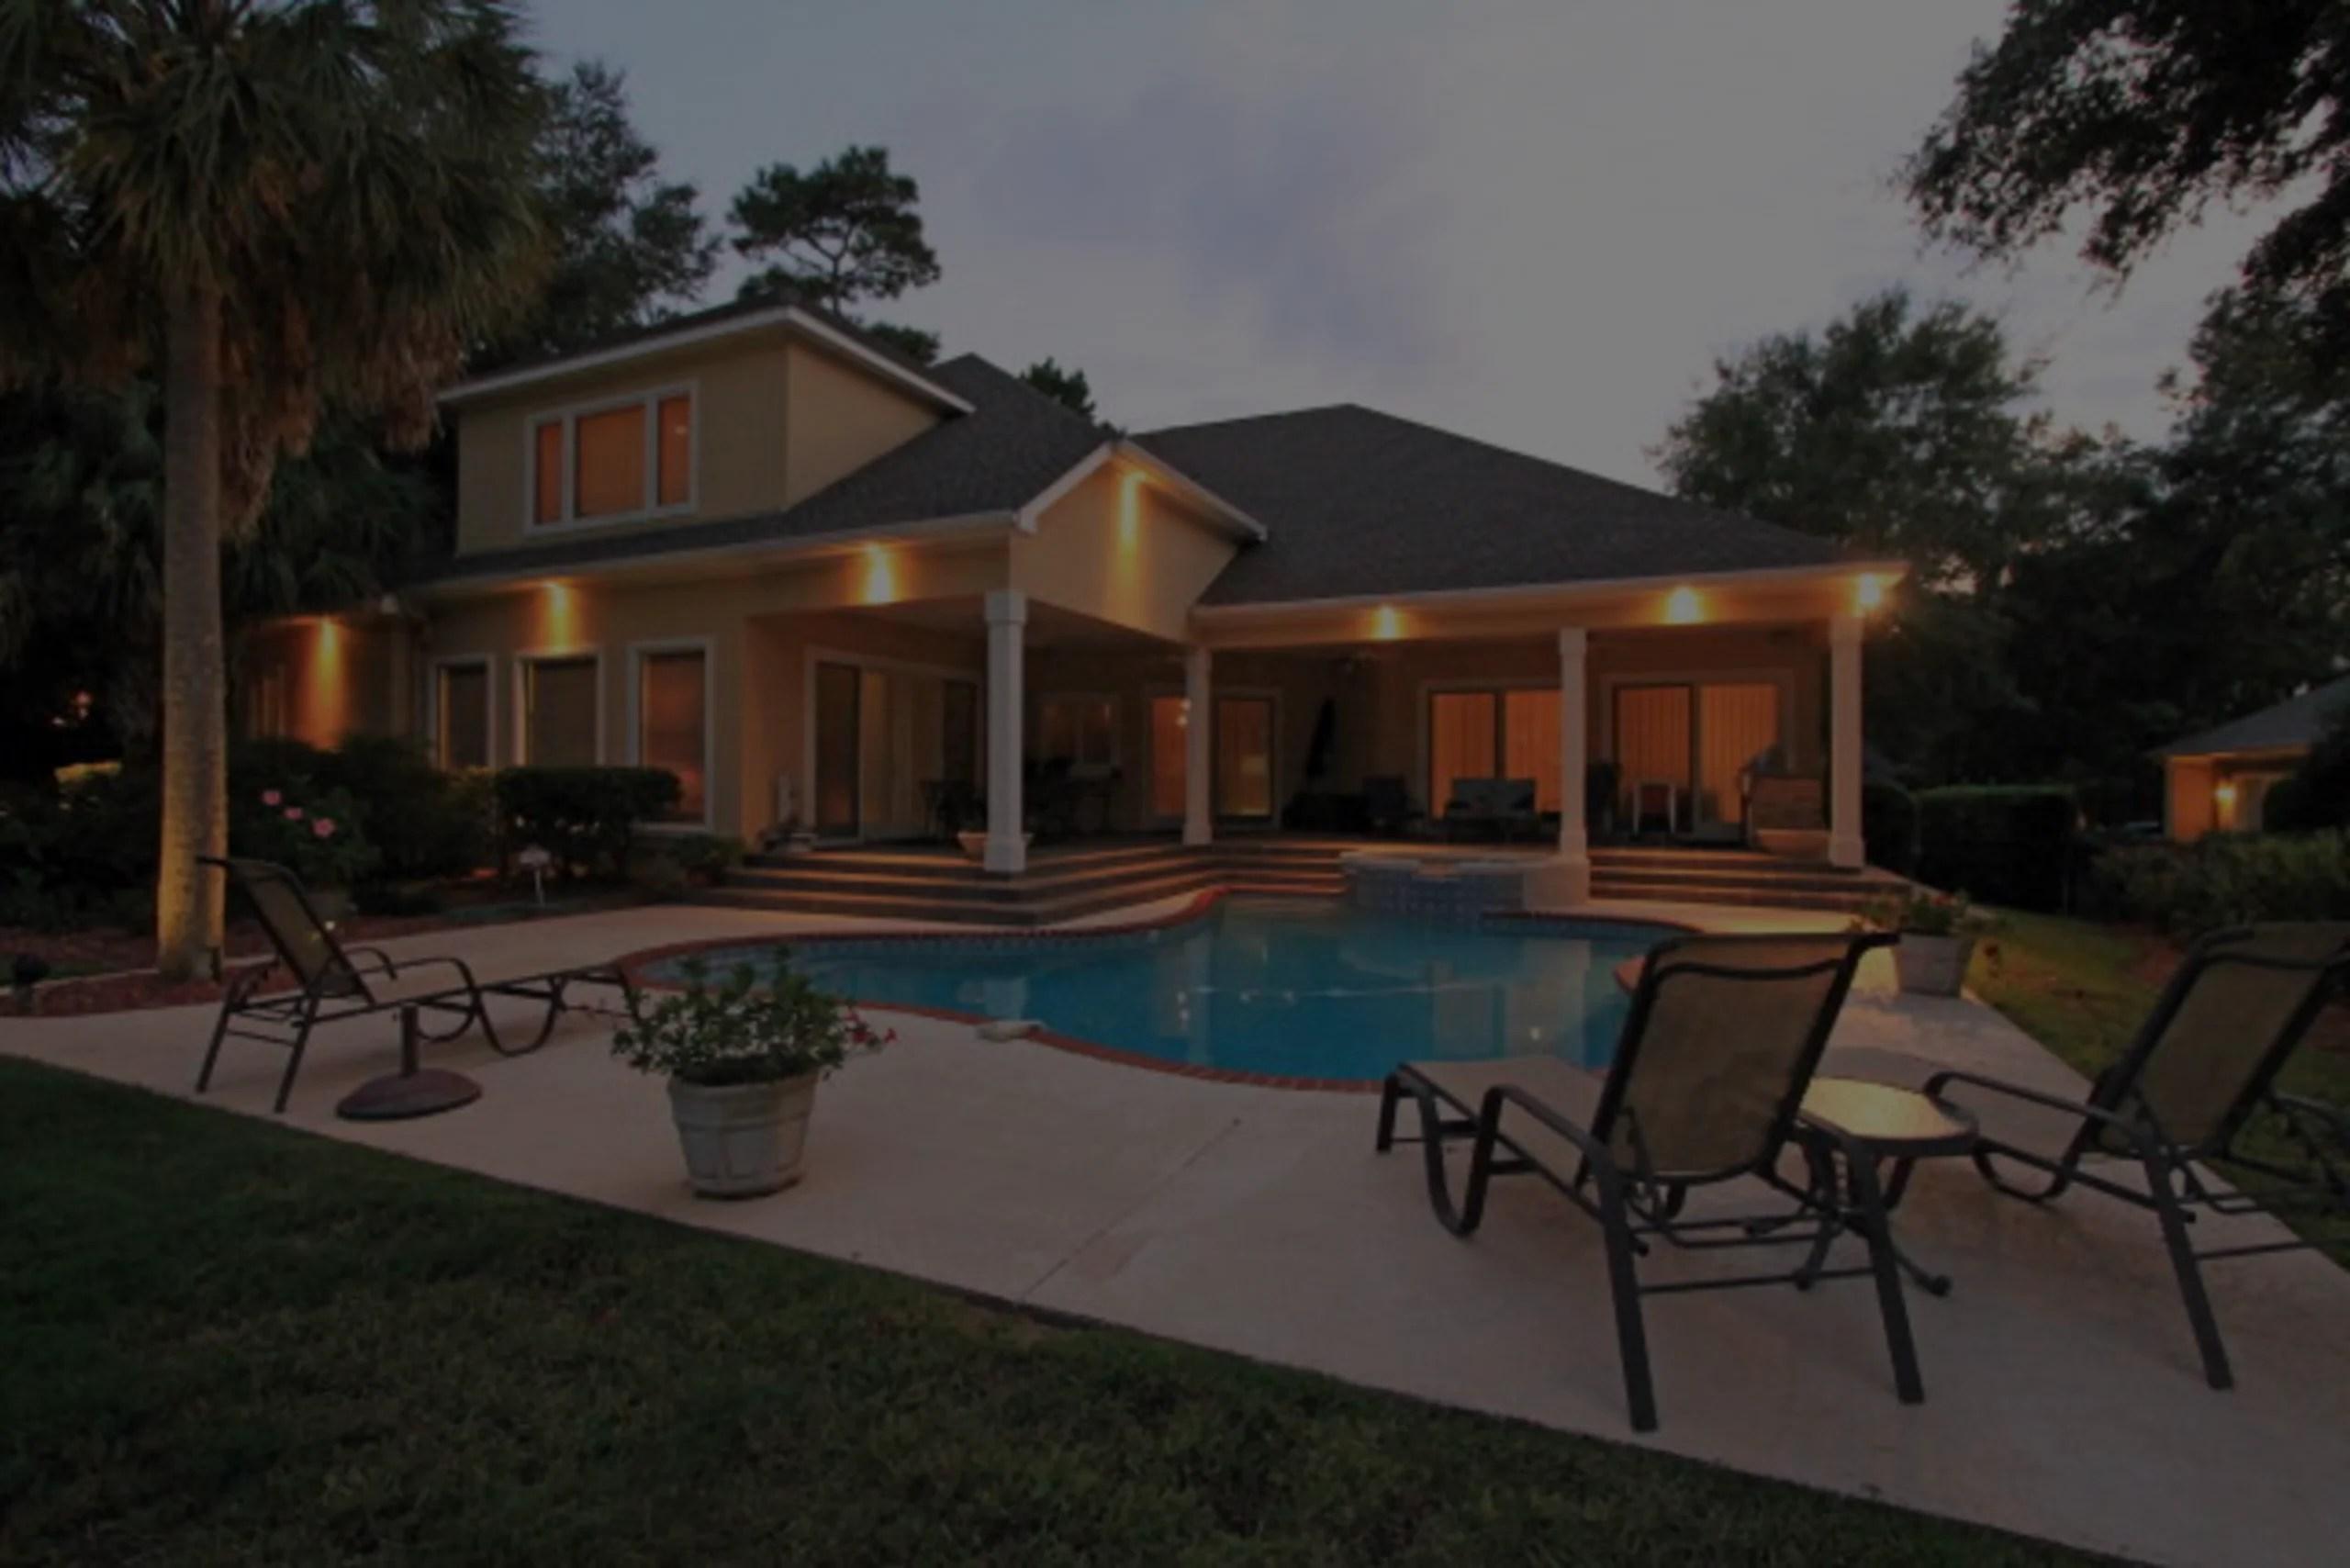 homes for sale in rock creek fairhope